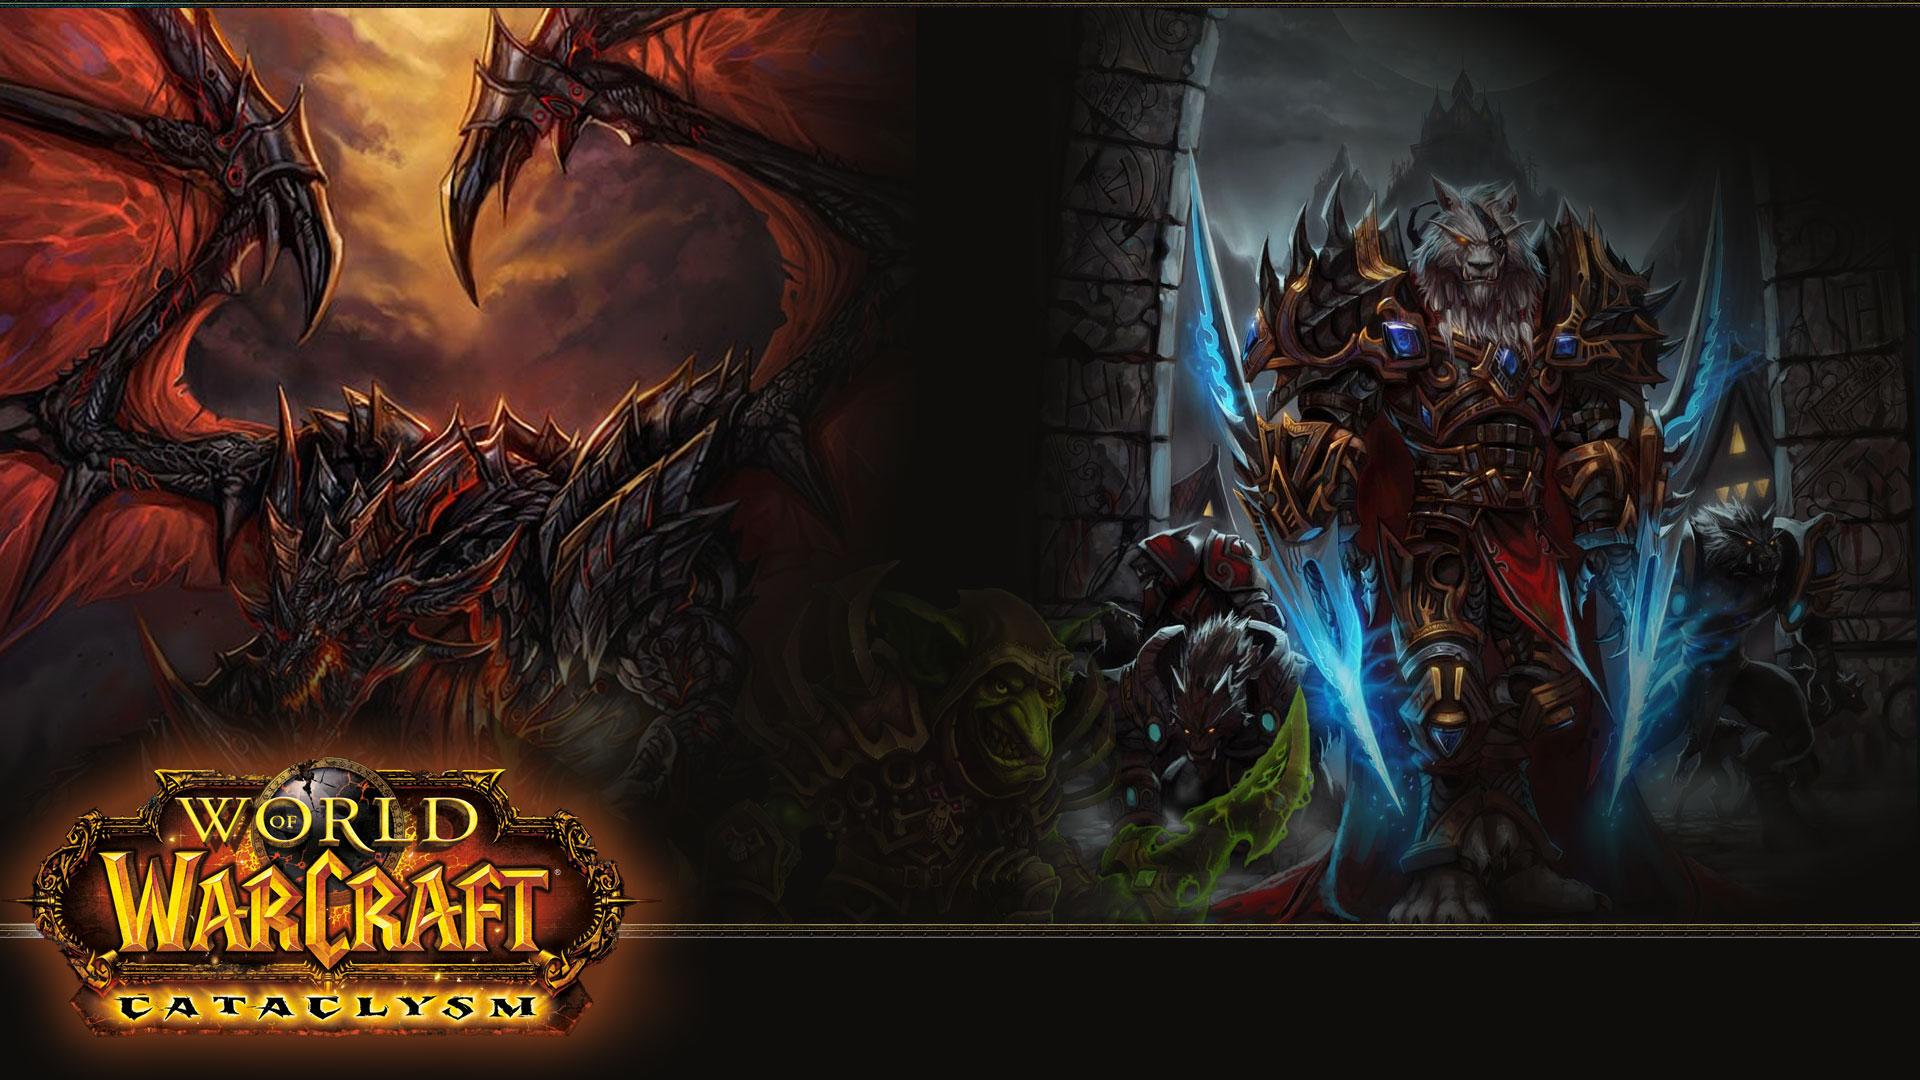 World Of Warcraft Cataclysm Fondo De Pantalla Hd Fondo De